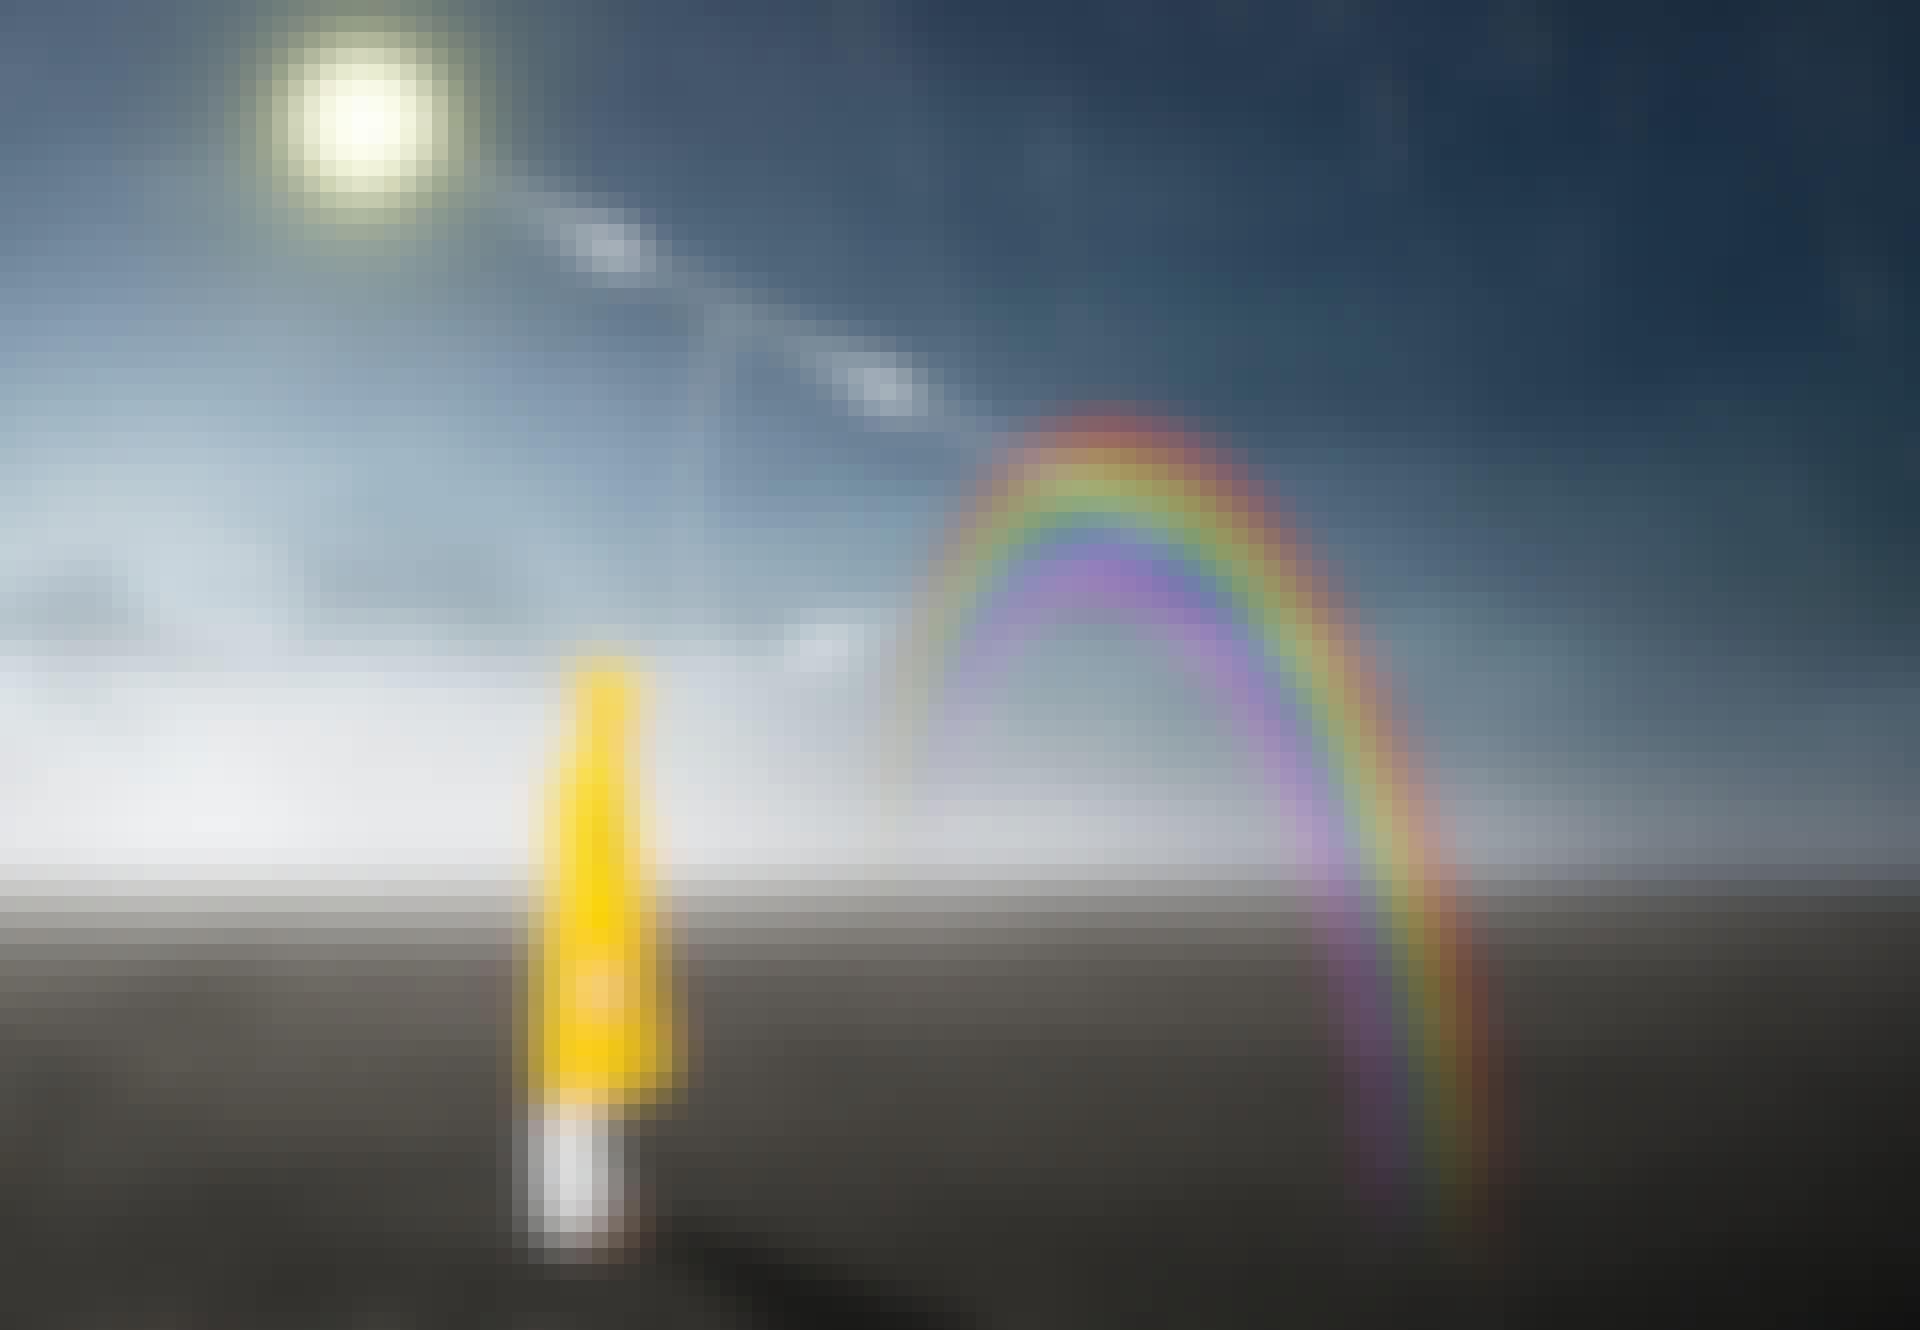 Sådan opstår en regnbue